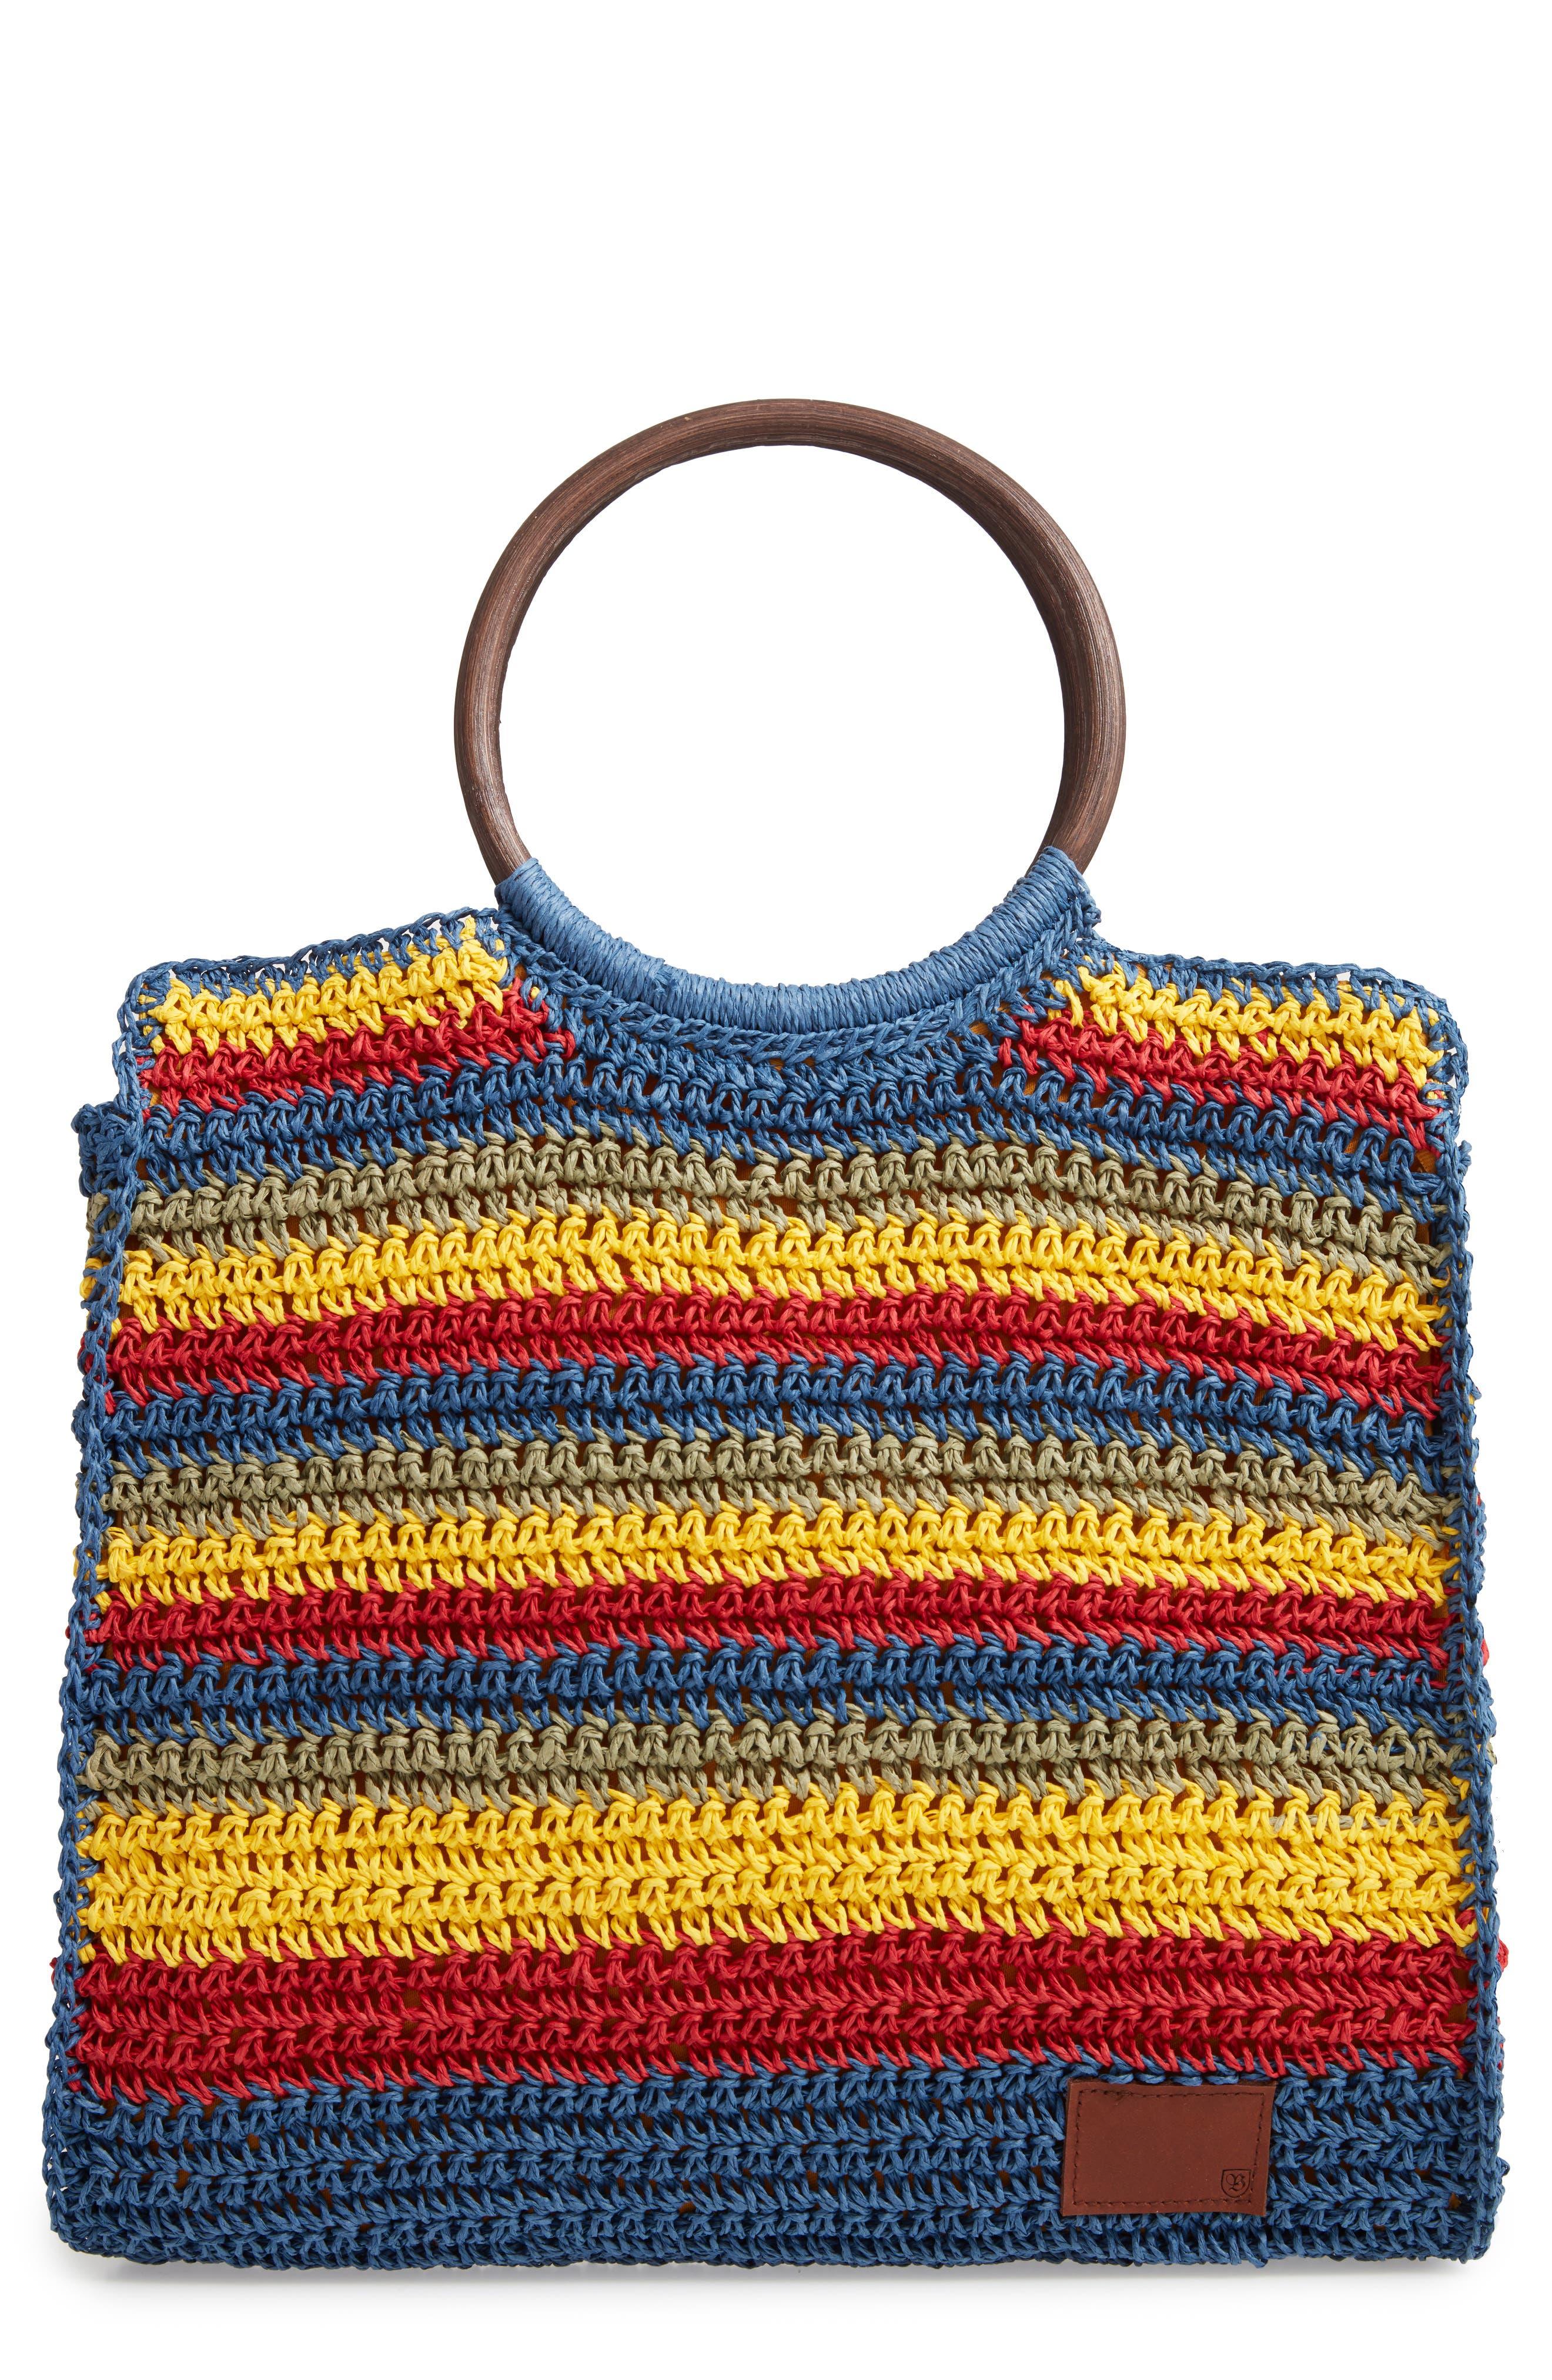 Vintage Handbags, Purses, Bags *New* Brixton Riviera Ring Handle Tote - Blue $69.00 AT vintagedancer.com